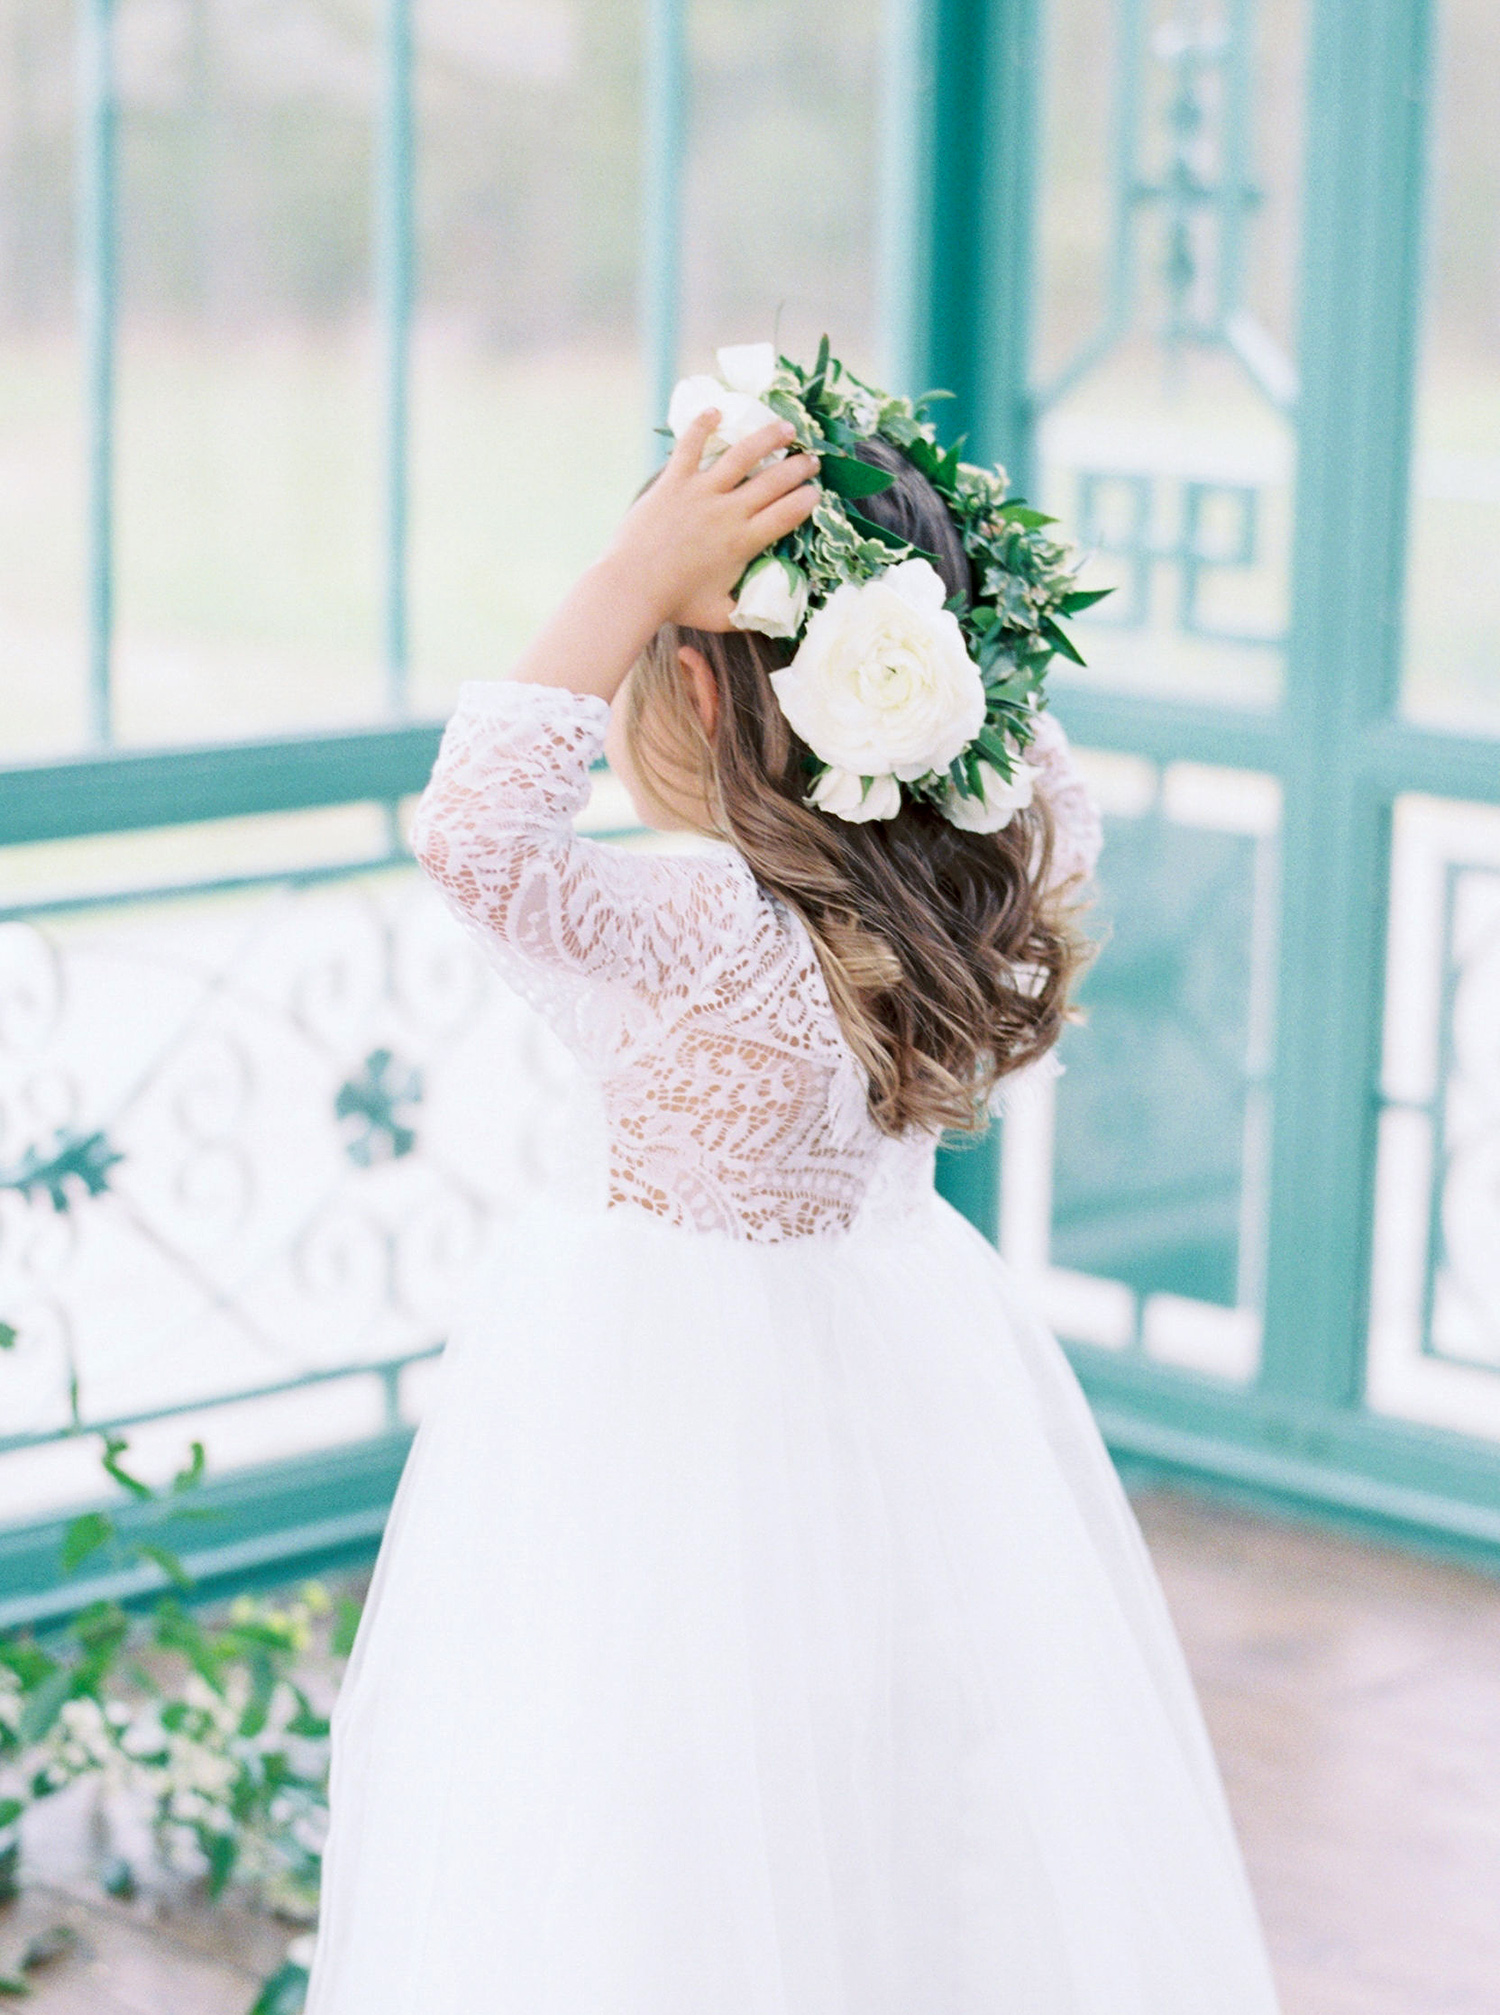 evan dustin vow renewal daughter flower girl